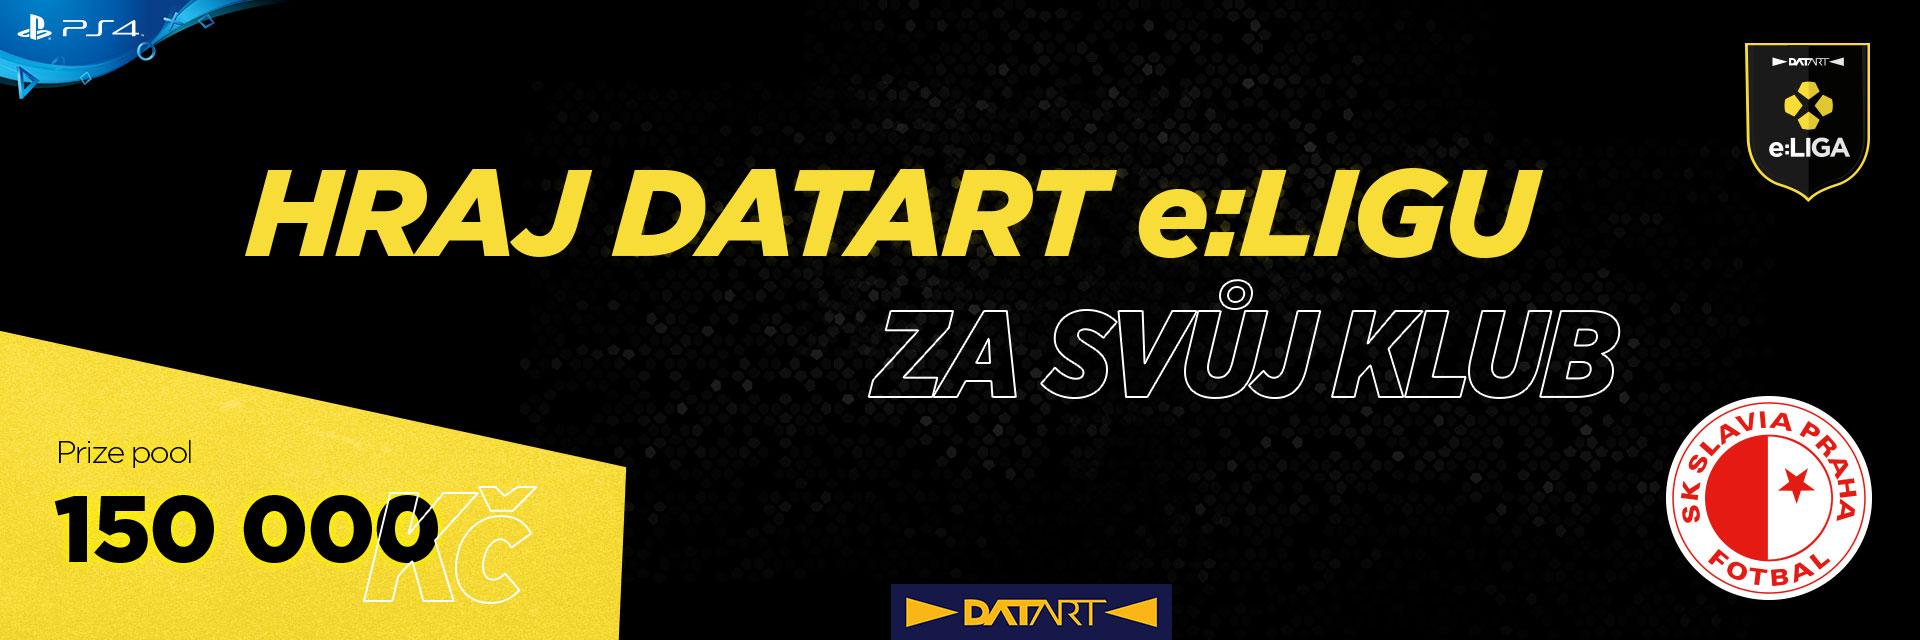 datart-e-liga-semifinale-sk-slavia-praha